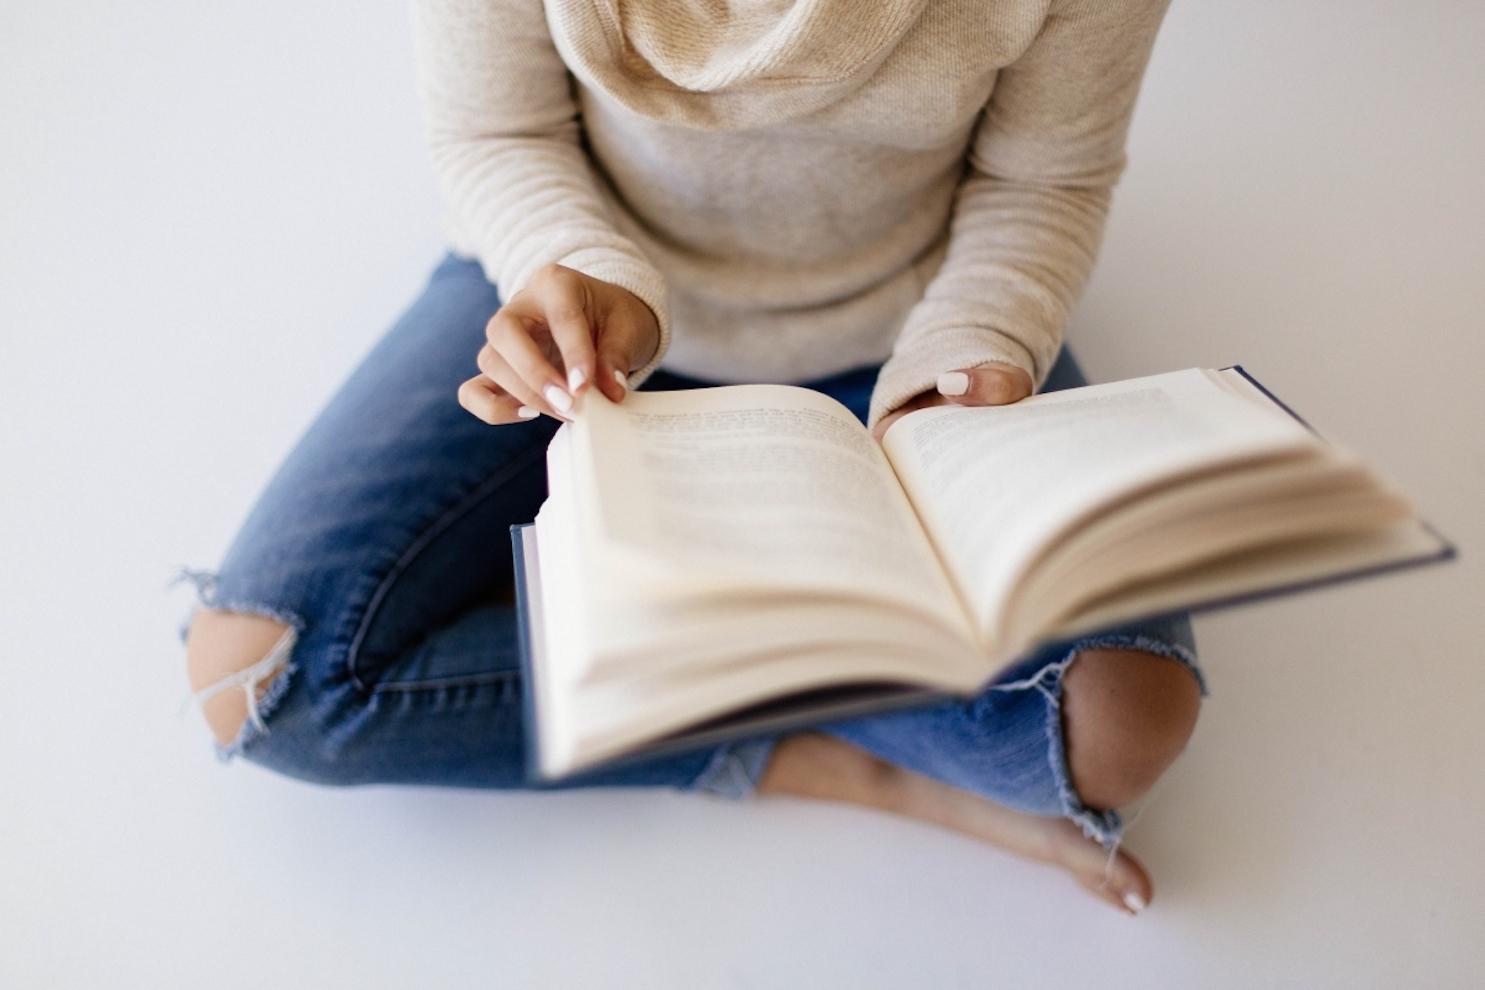 Woman sitting on floor reading book